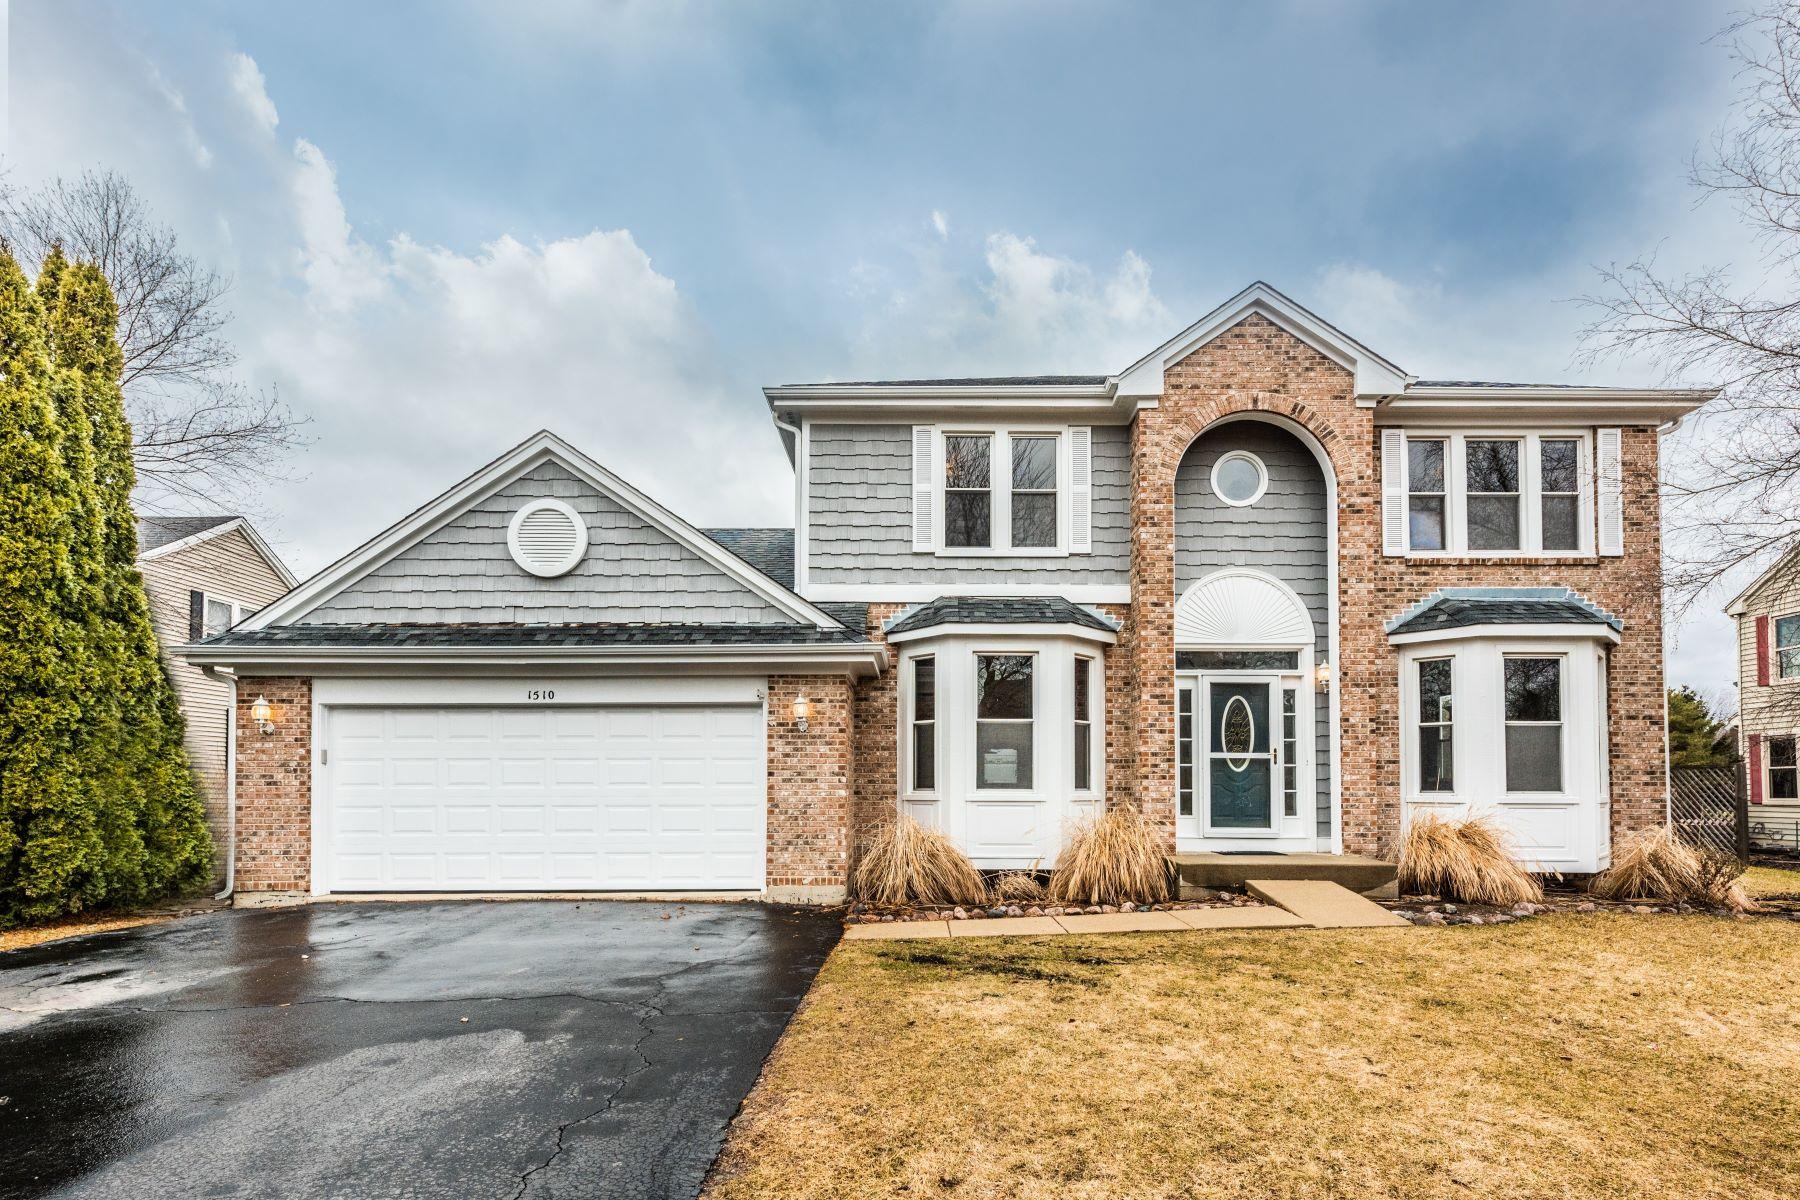 Single Family Home for Sale at Beautiful Woodcreek Home 1510 Dogwood Drive Crystal Lake, Illinois 60014 United States